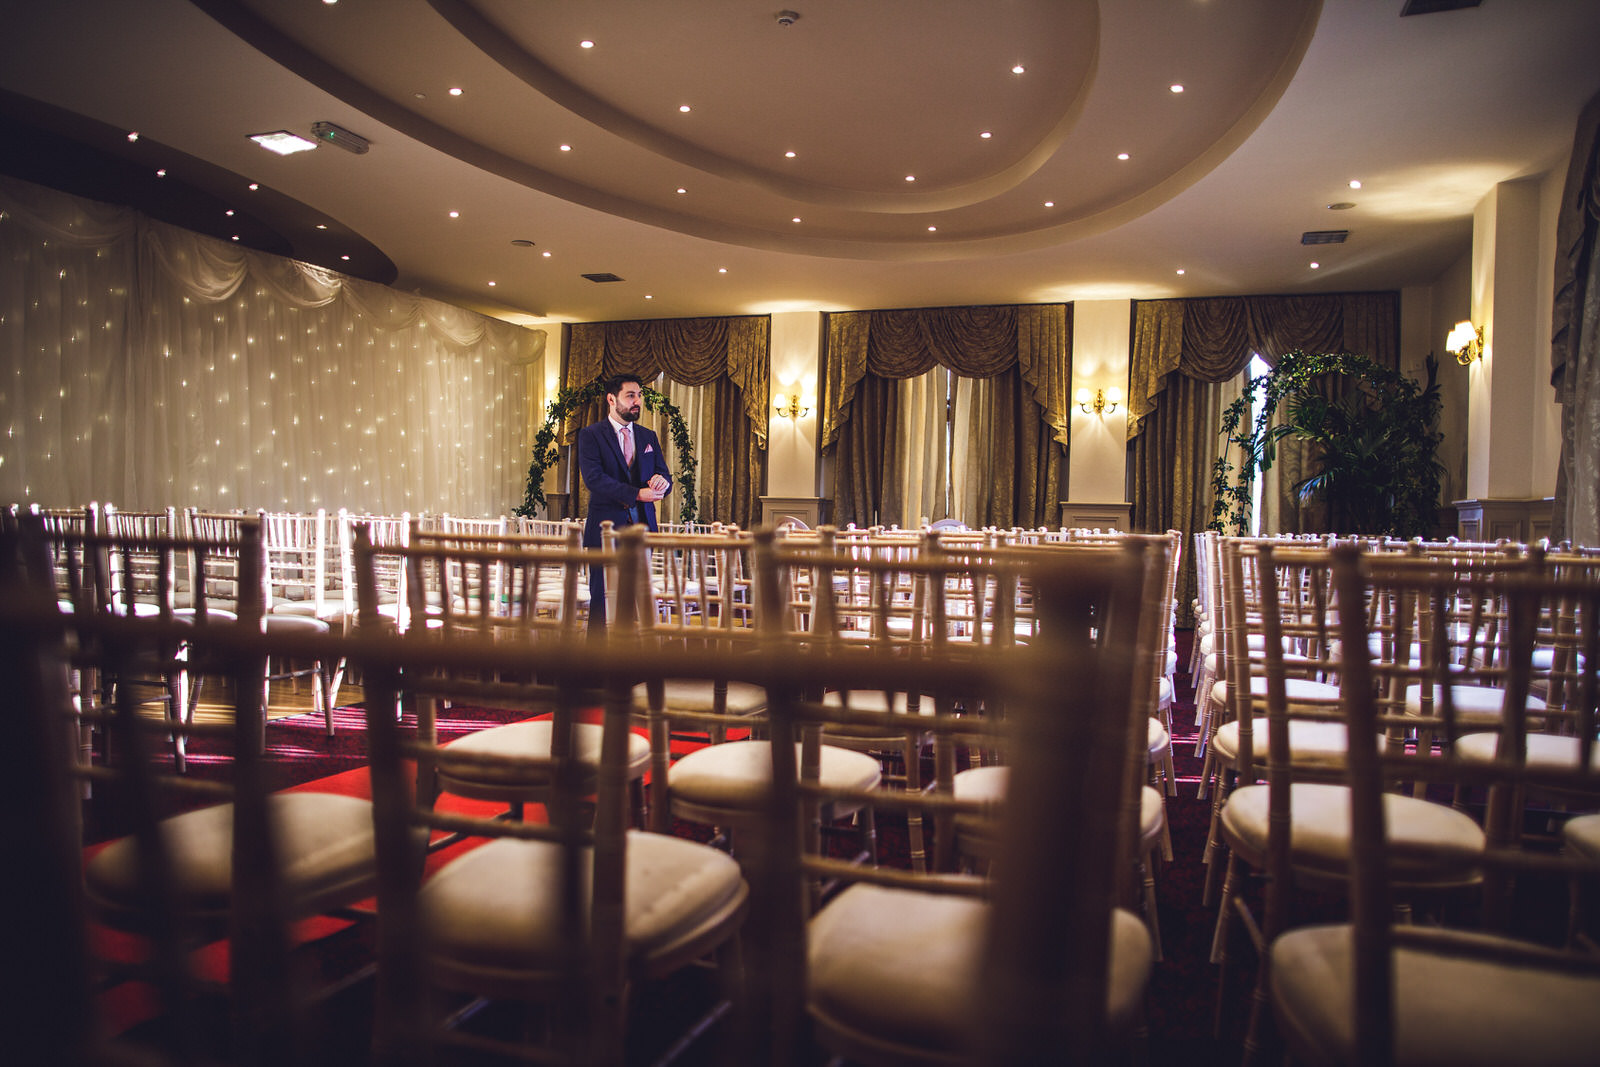 Roger-kenny-wedding-photographer-greystones-wicklow-dublin_003.jpg